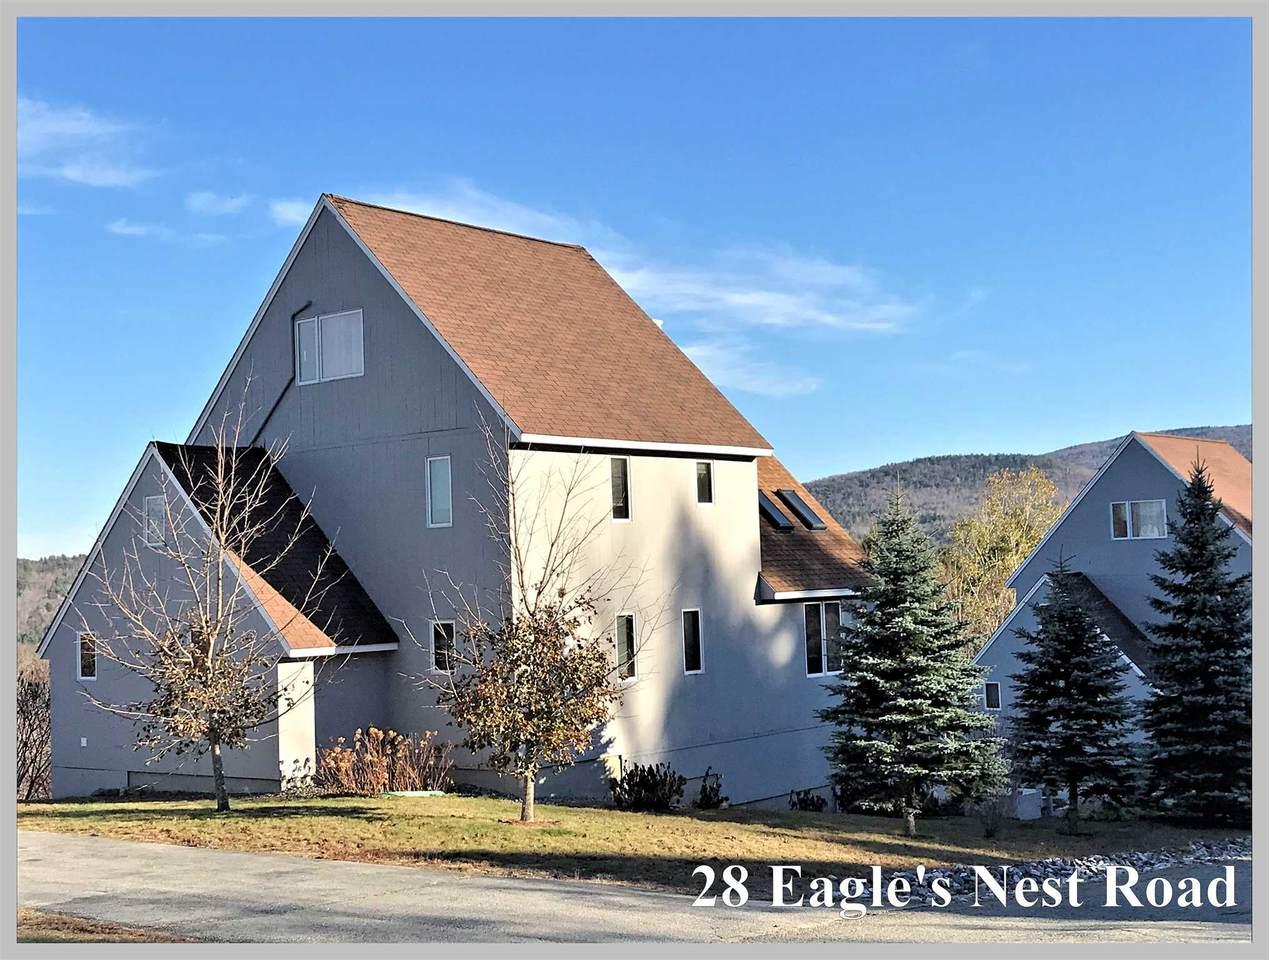 28 Eagles Nest Road - Photo 1